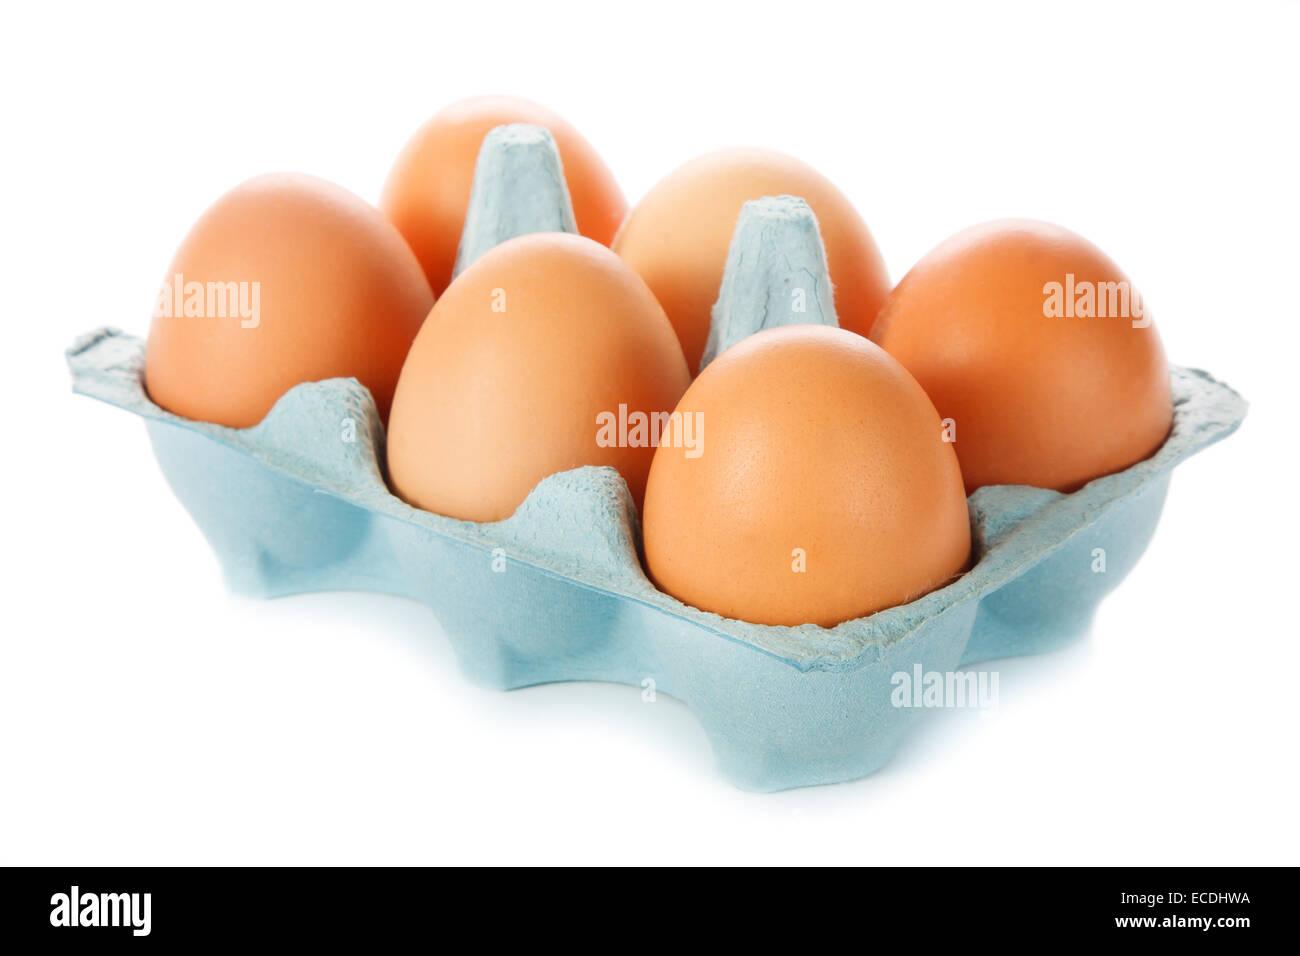 Cardboard egg box and six eggs - Stock Image